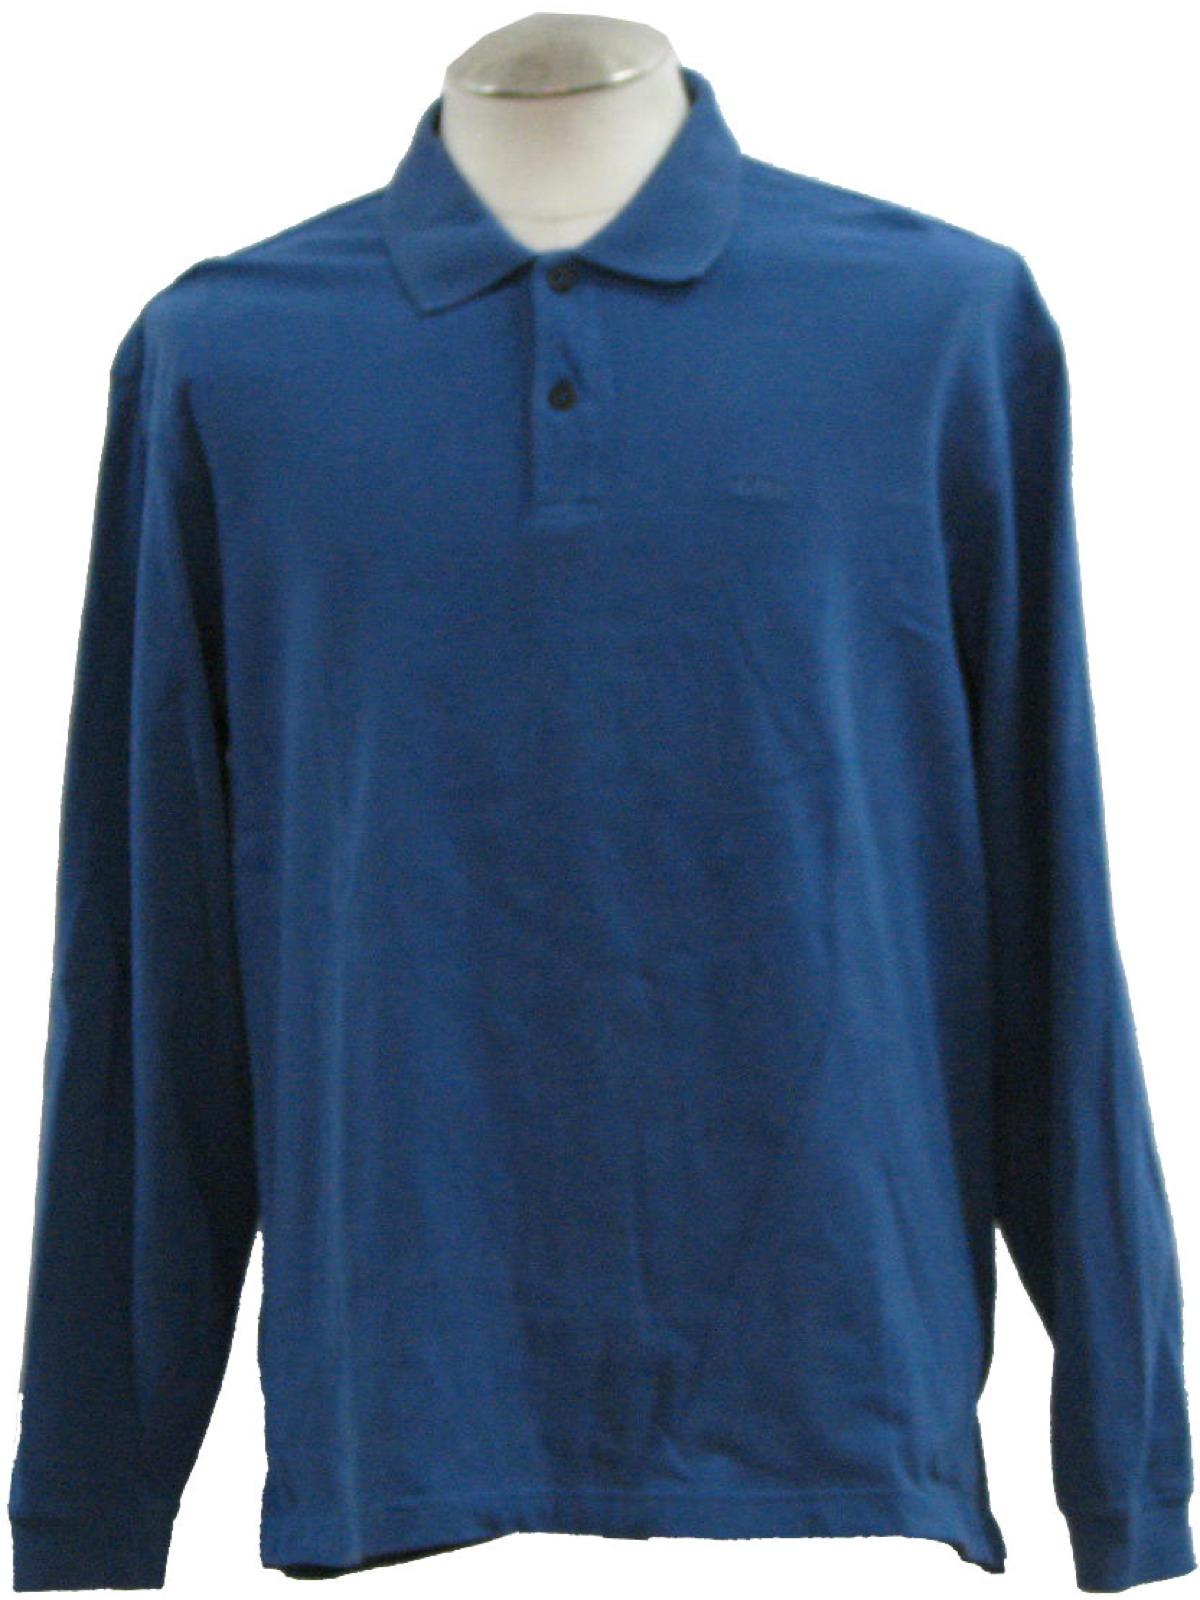 Izod Eighties Vintage Shirt 80s Izod Mens Dark Blue With Matching